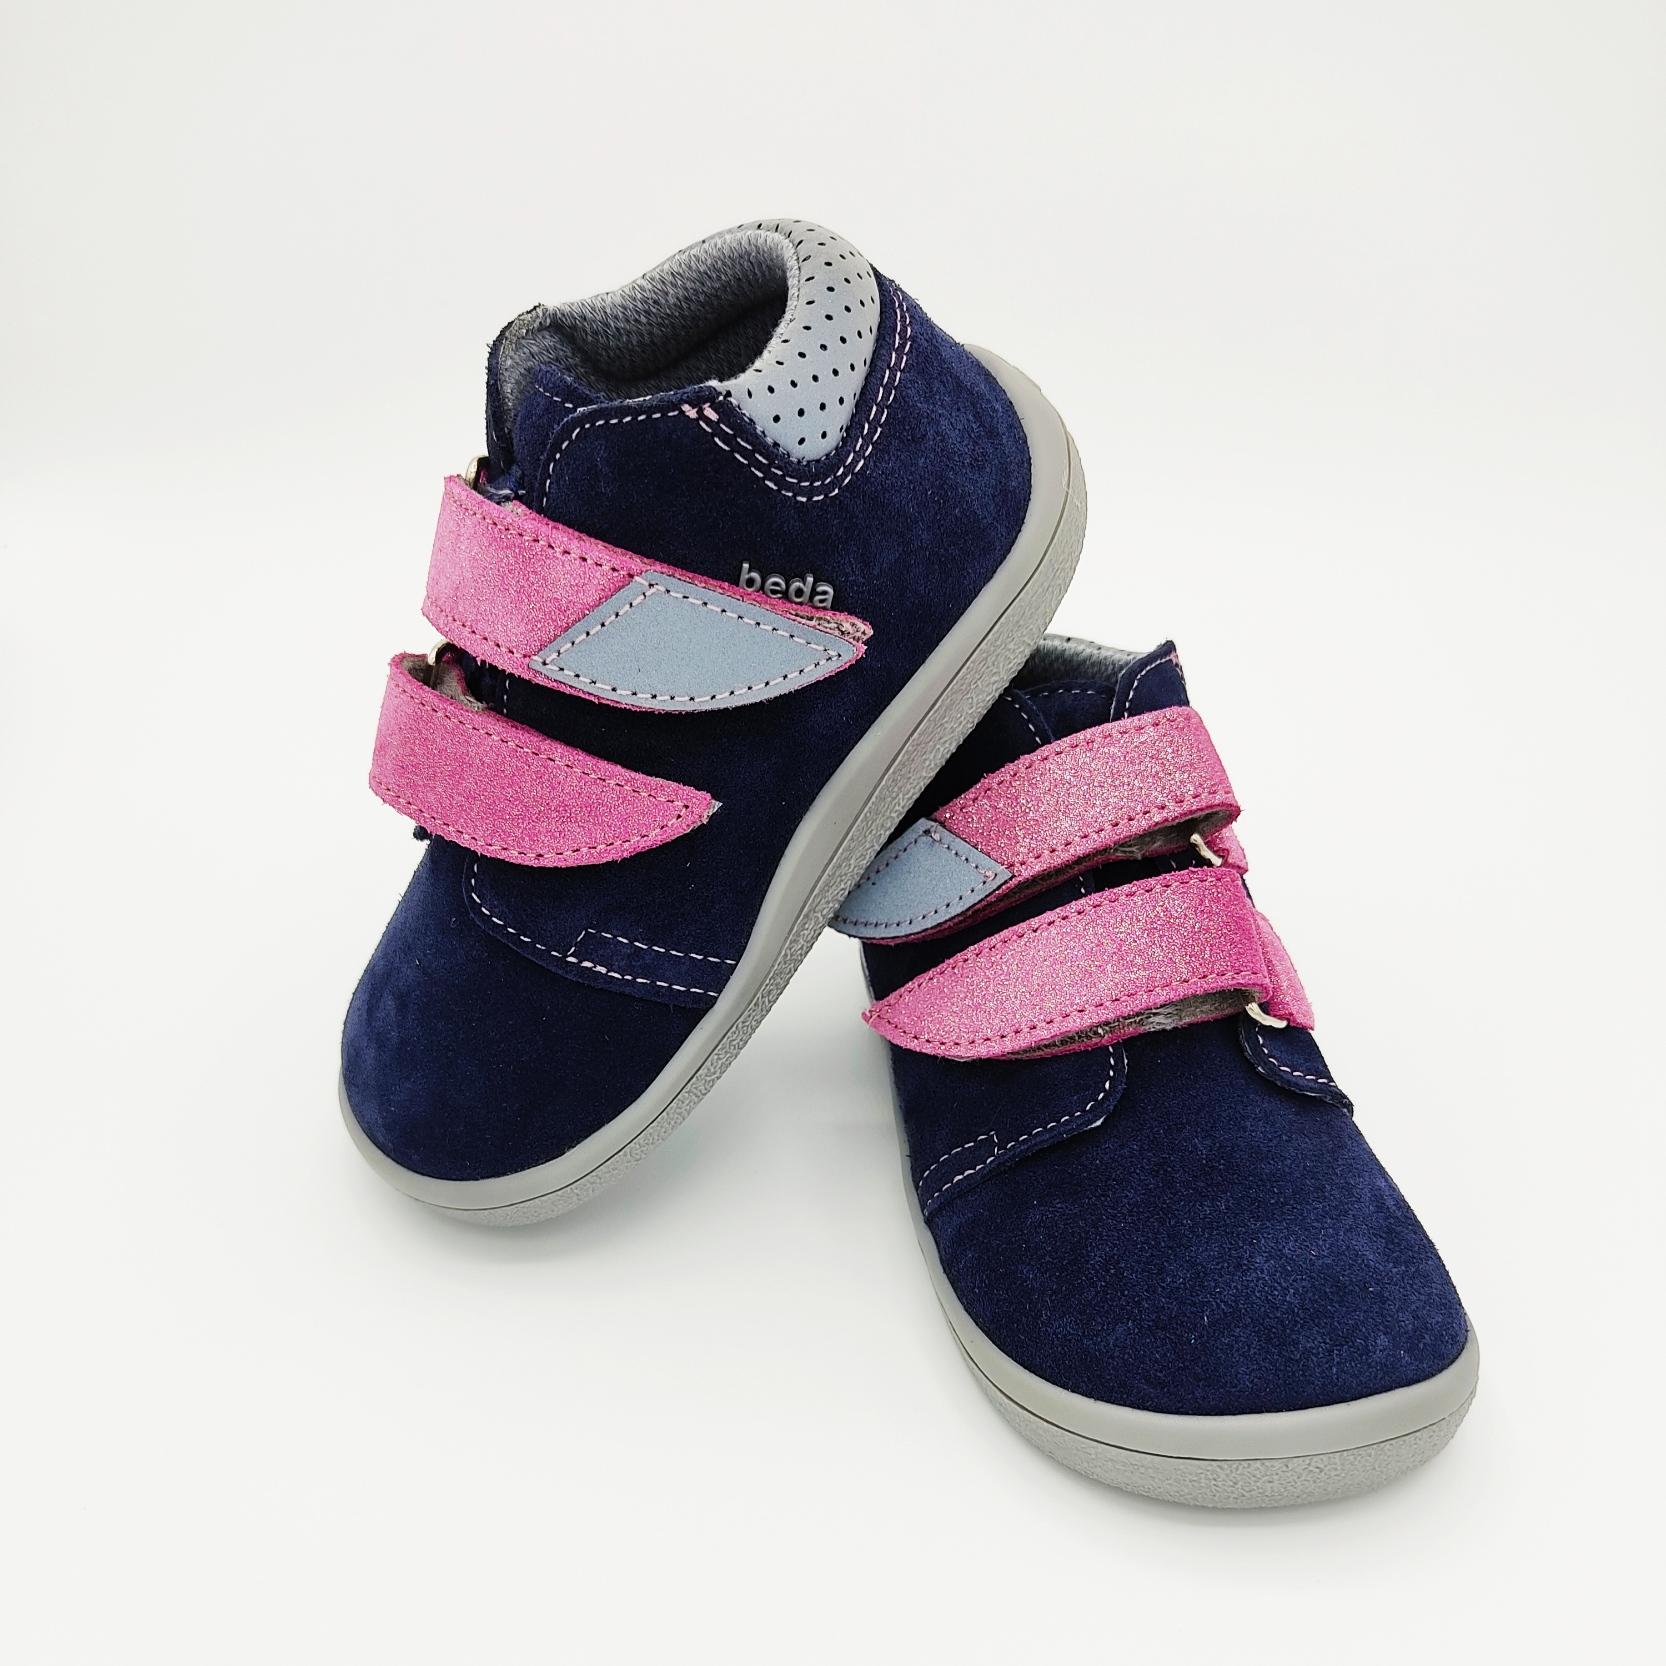 Beda - Chaussures montantes - Ocean shine